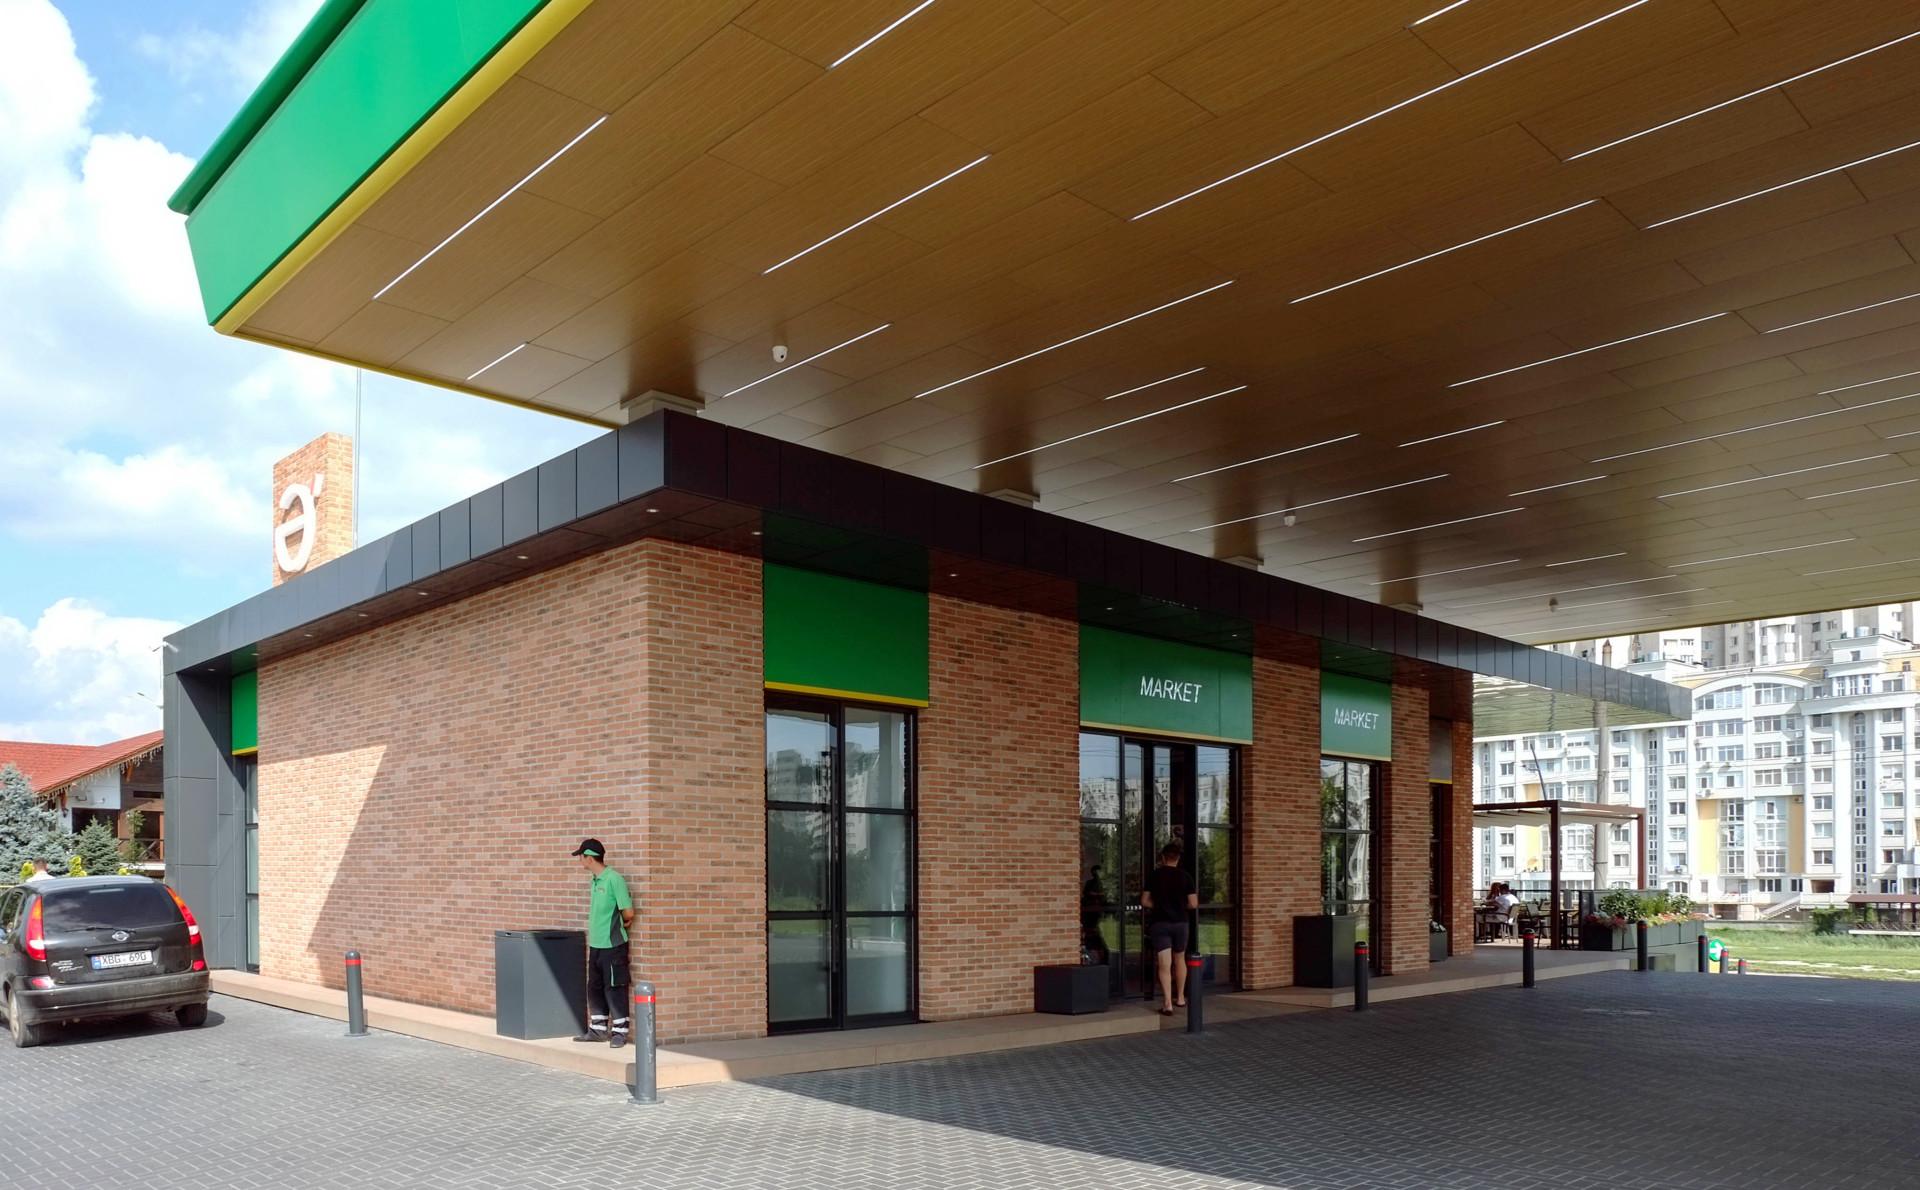 Wisp-Bemol-gas-station-exterior-view